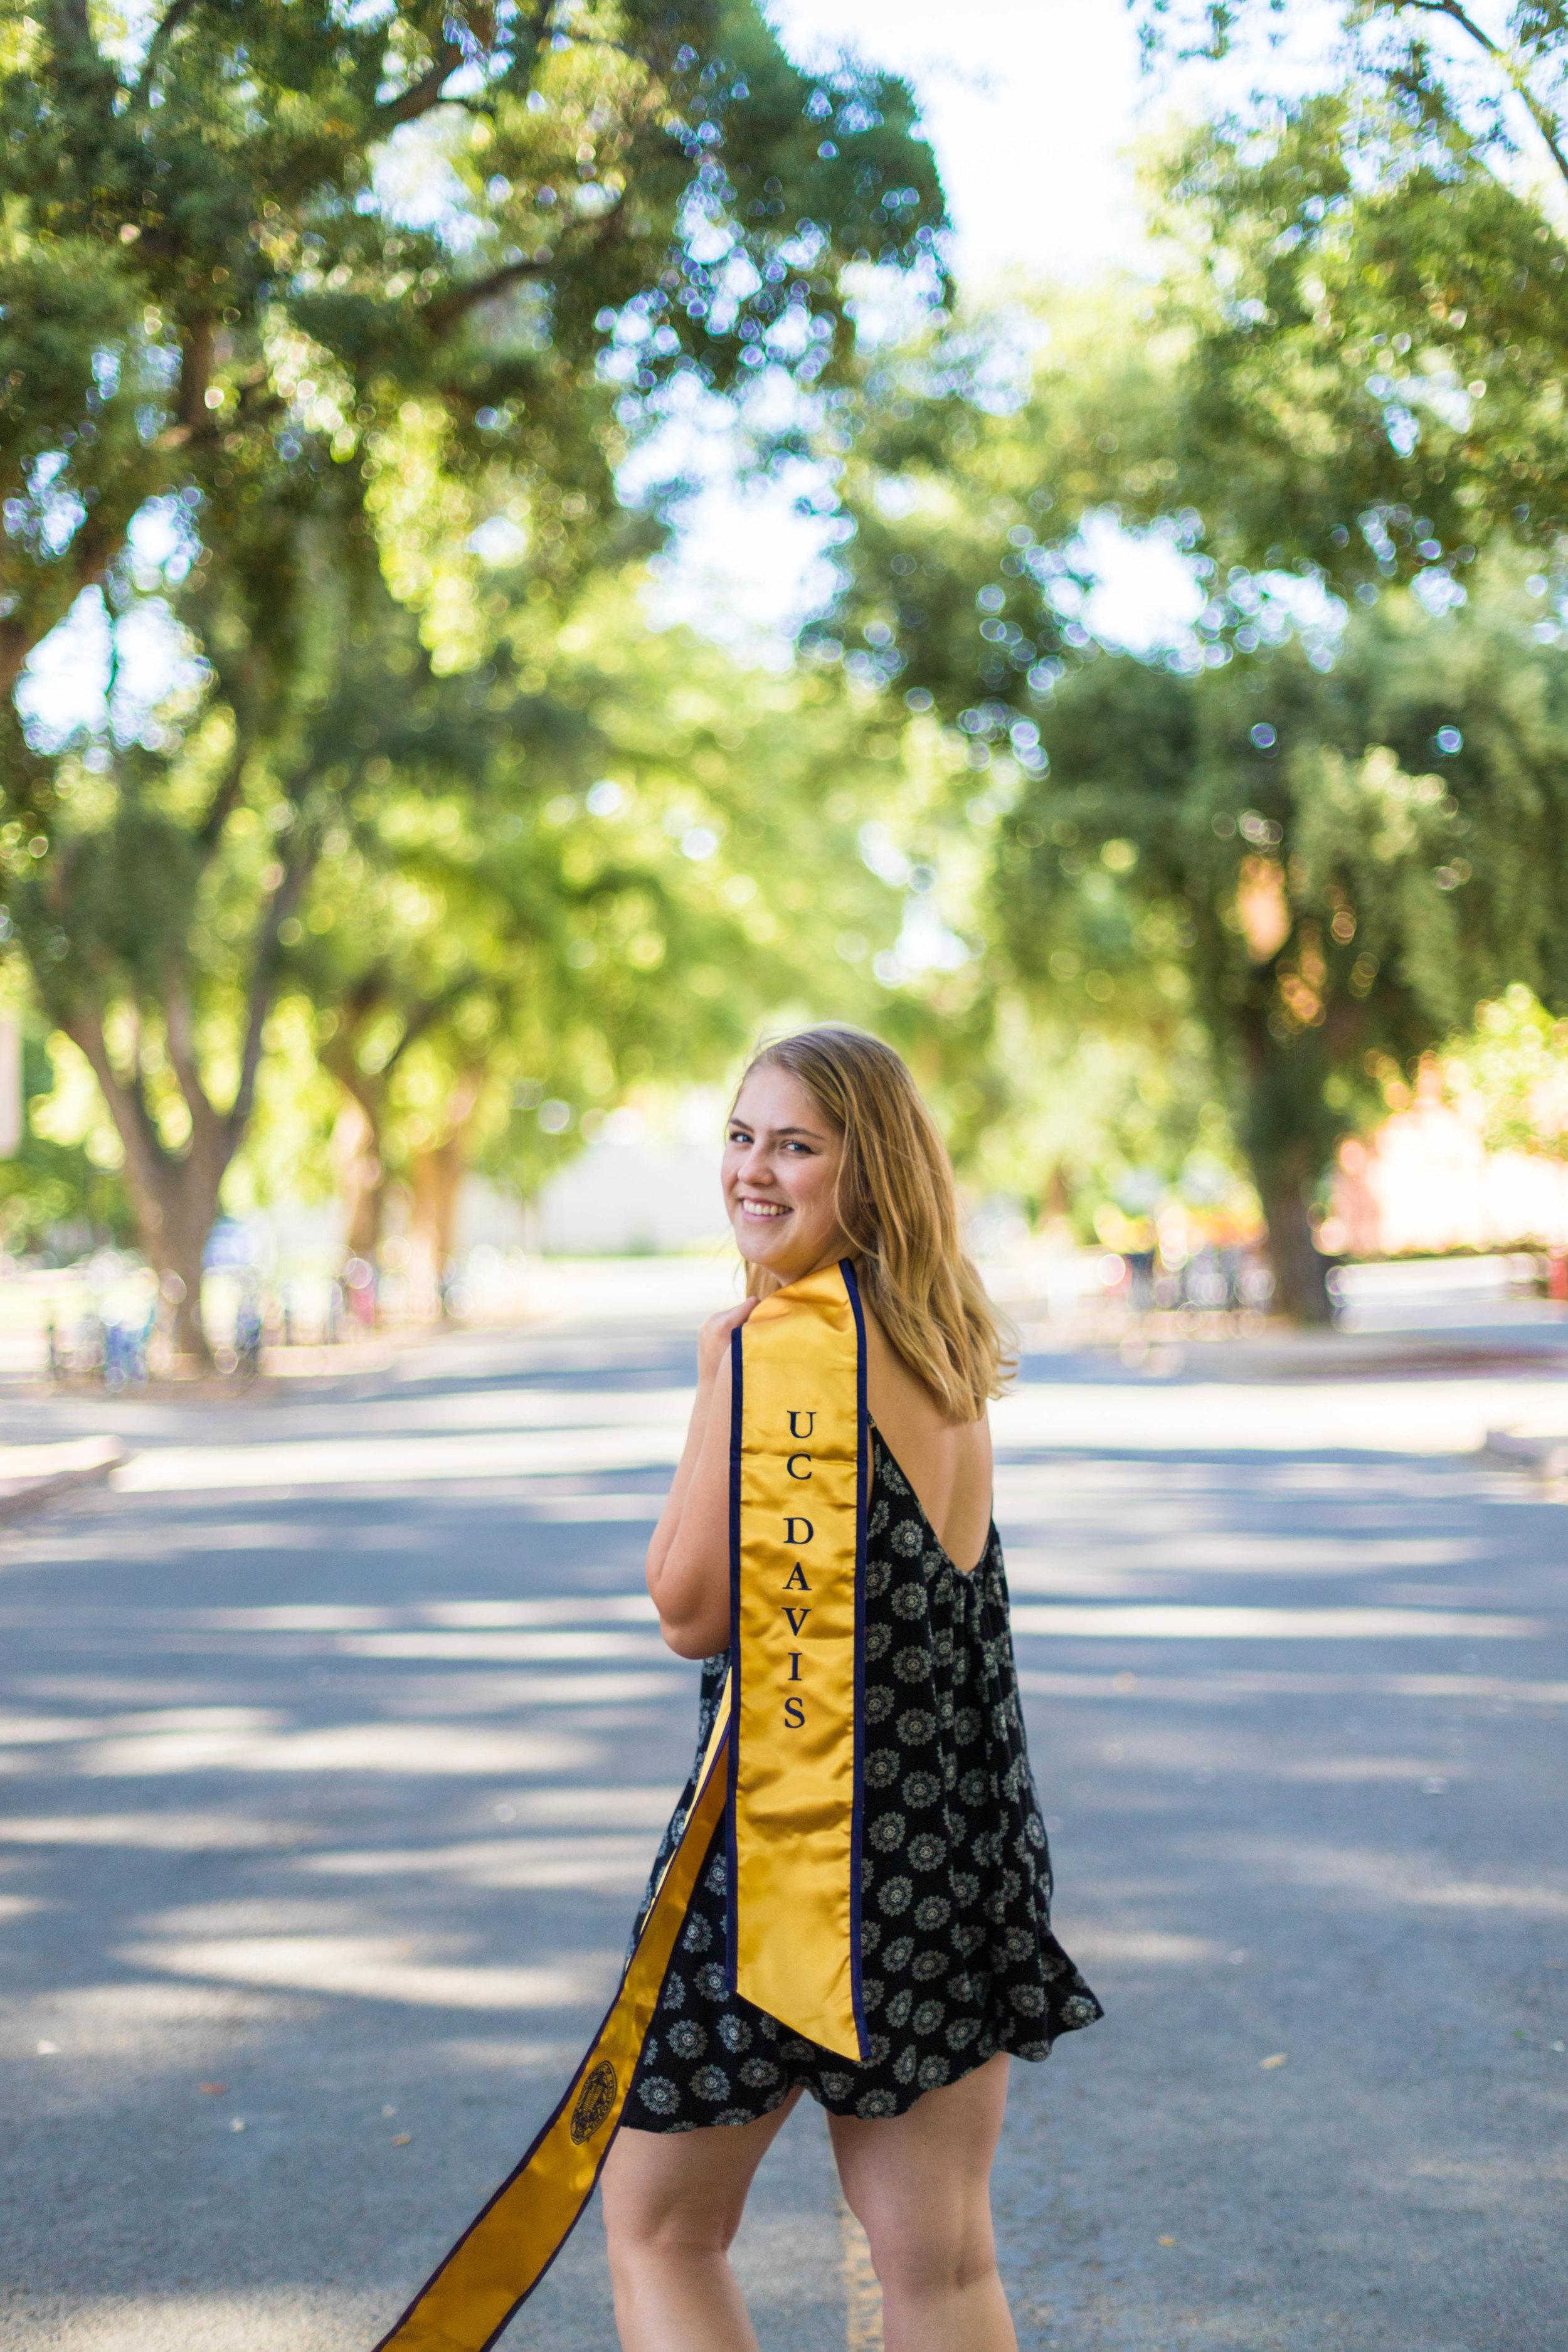 2018-05-19_Lily_Graduation_0052.jpg